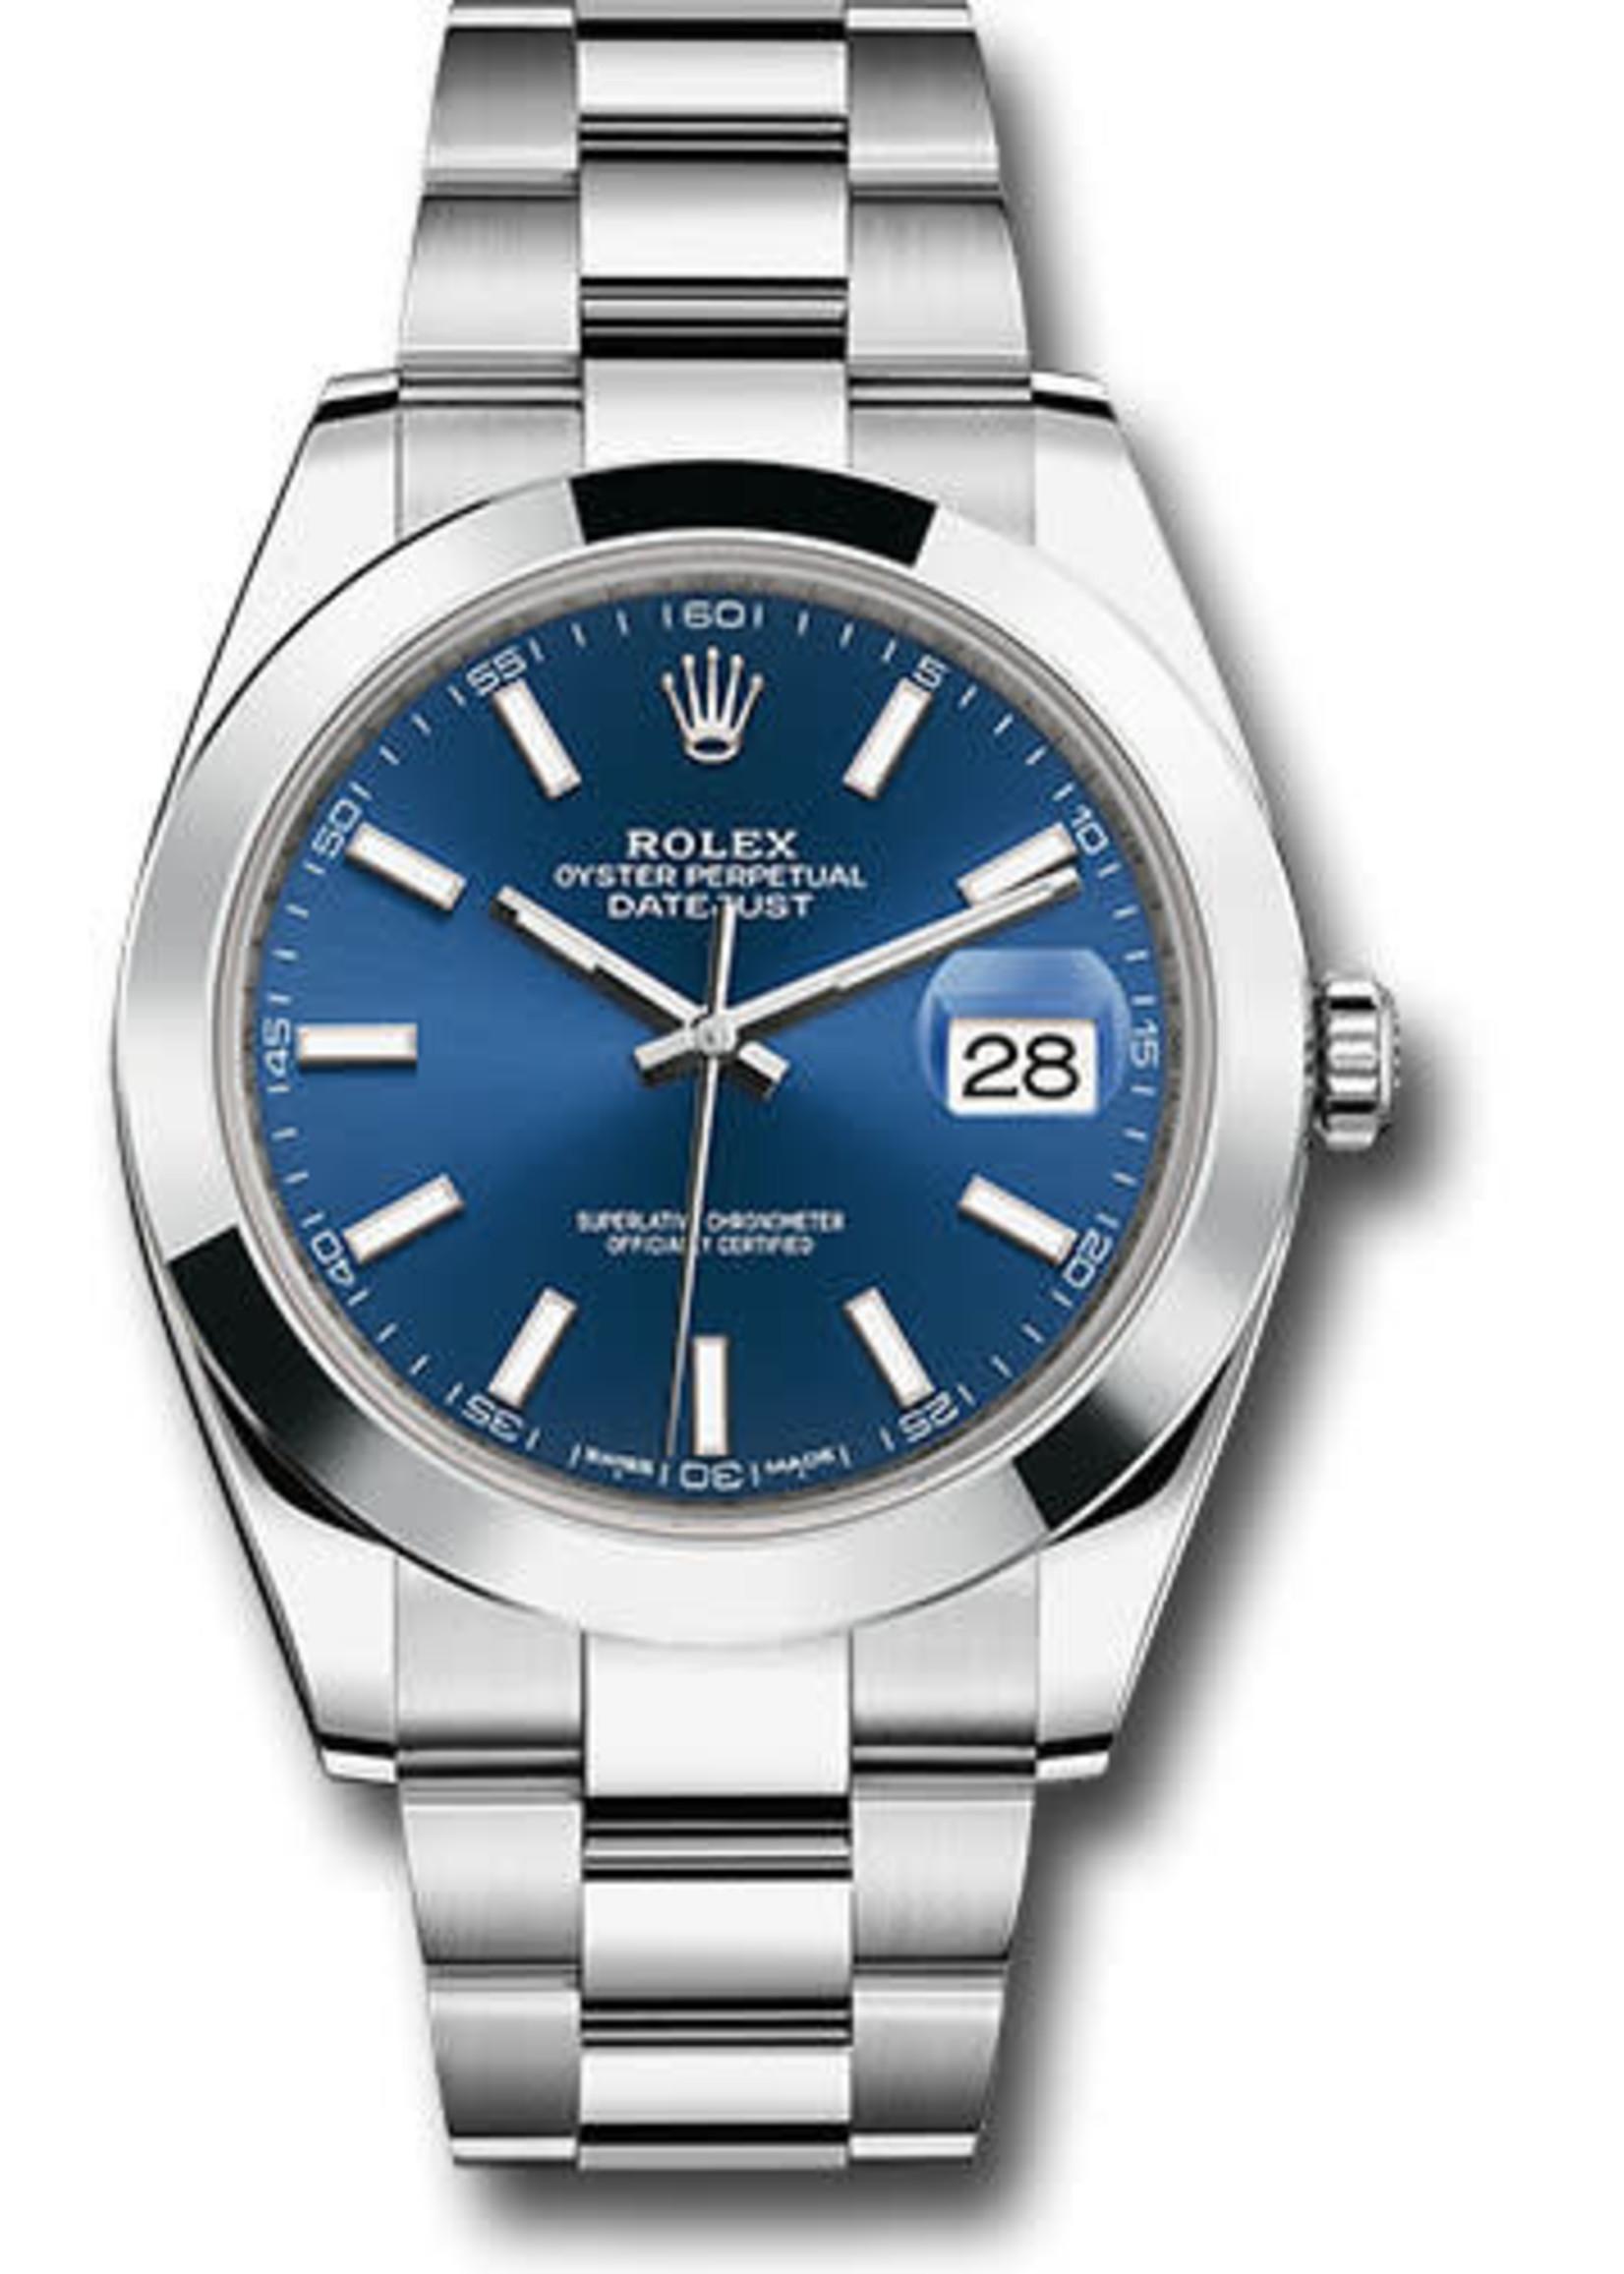 Rolex Rolex Datejust 41MM #126300 (2021 B+P)